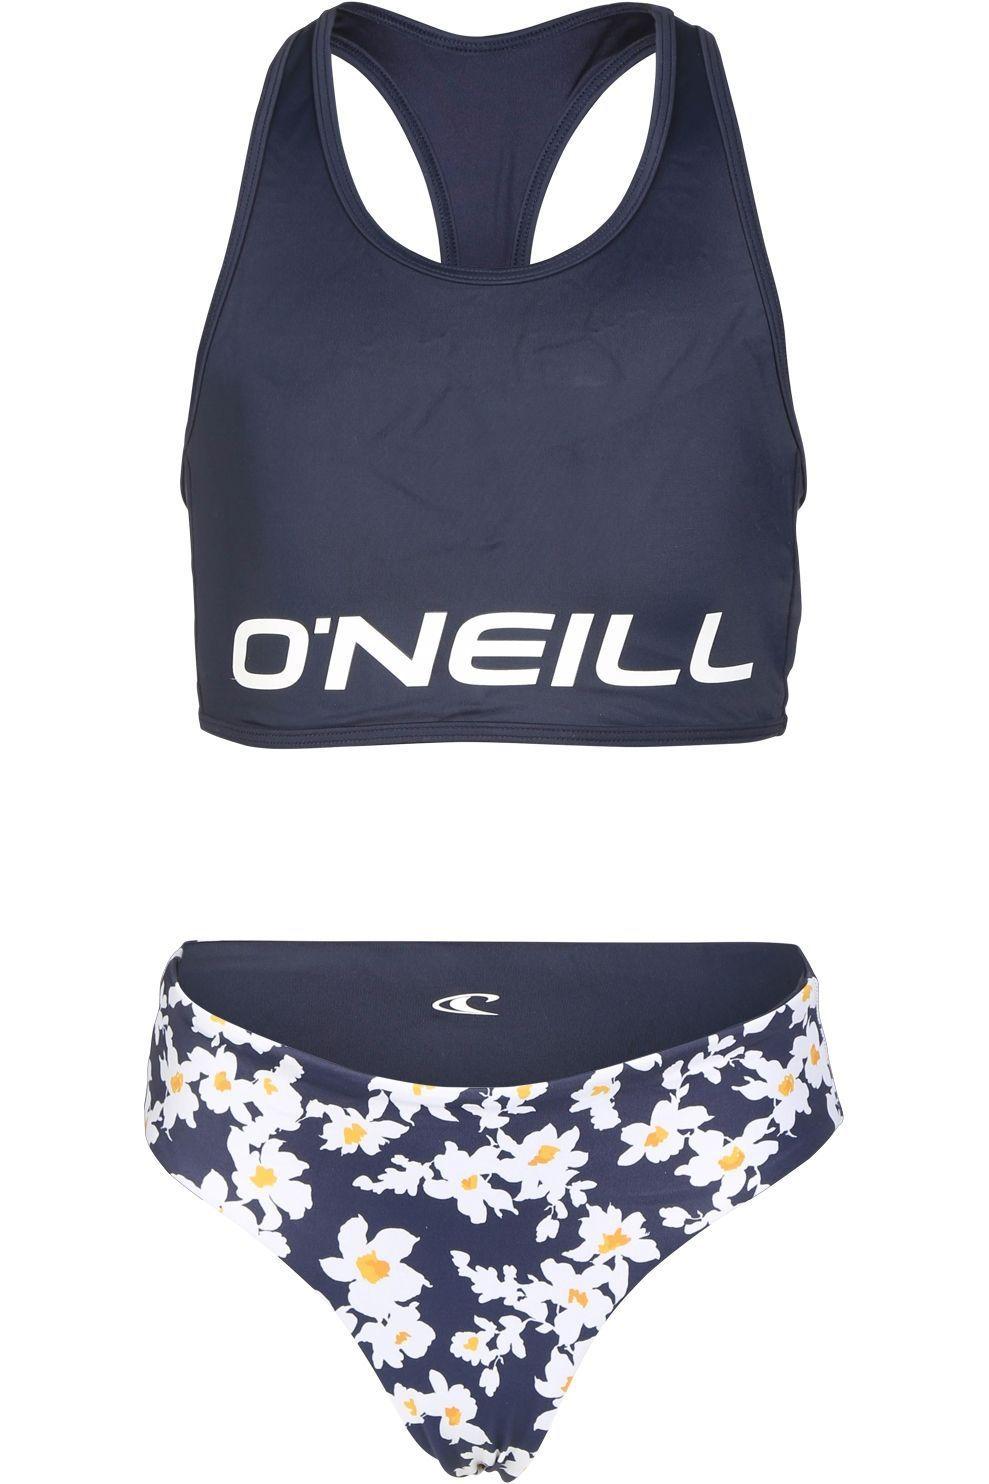 O'Neill Bikini Pg O'Neill Active voor meisjes - Blauw - Maten: 140, 152, 164, 176